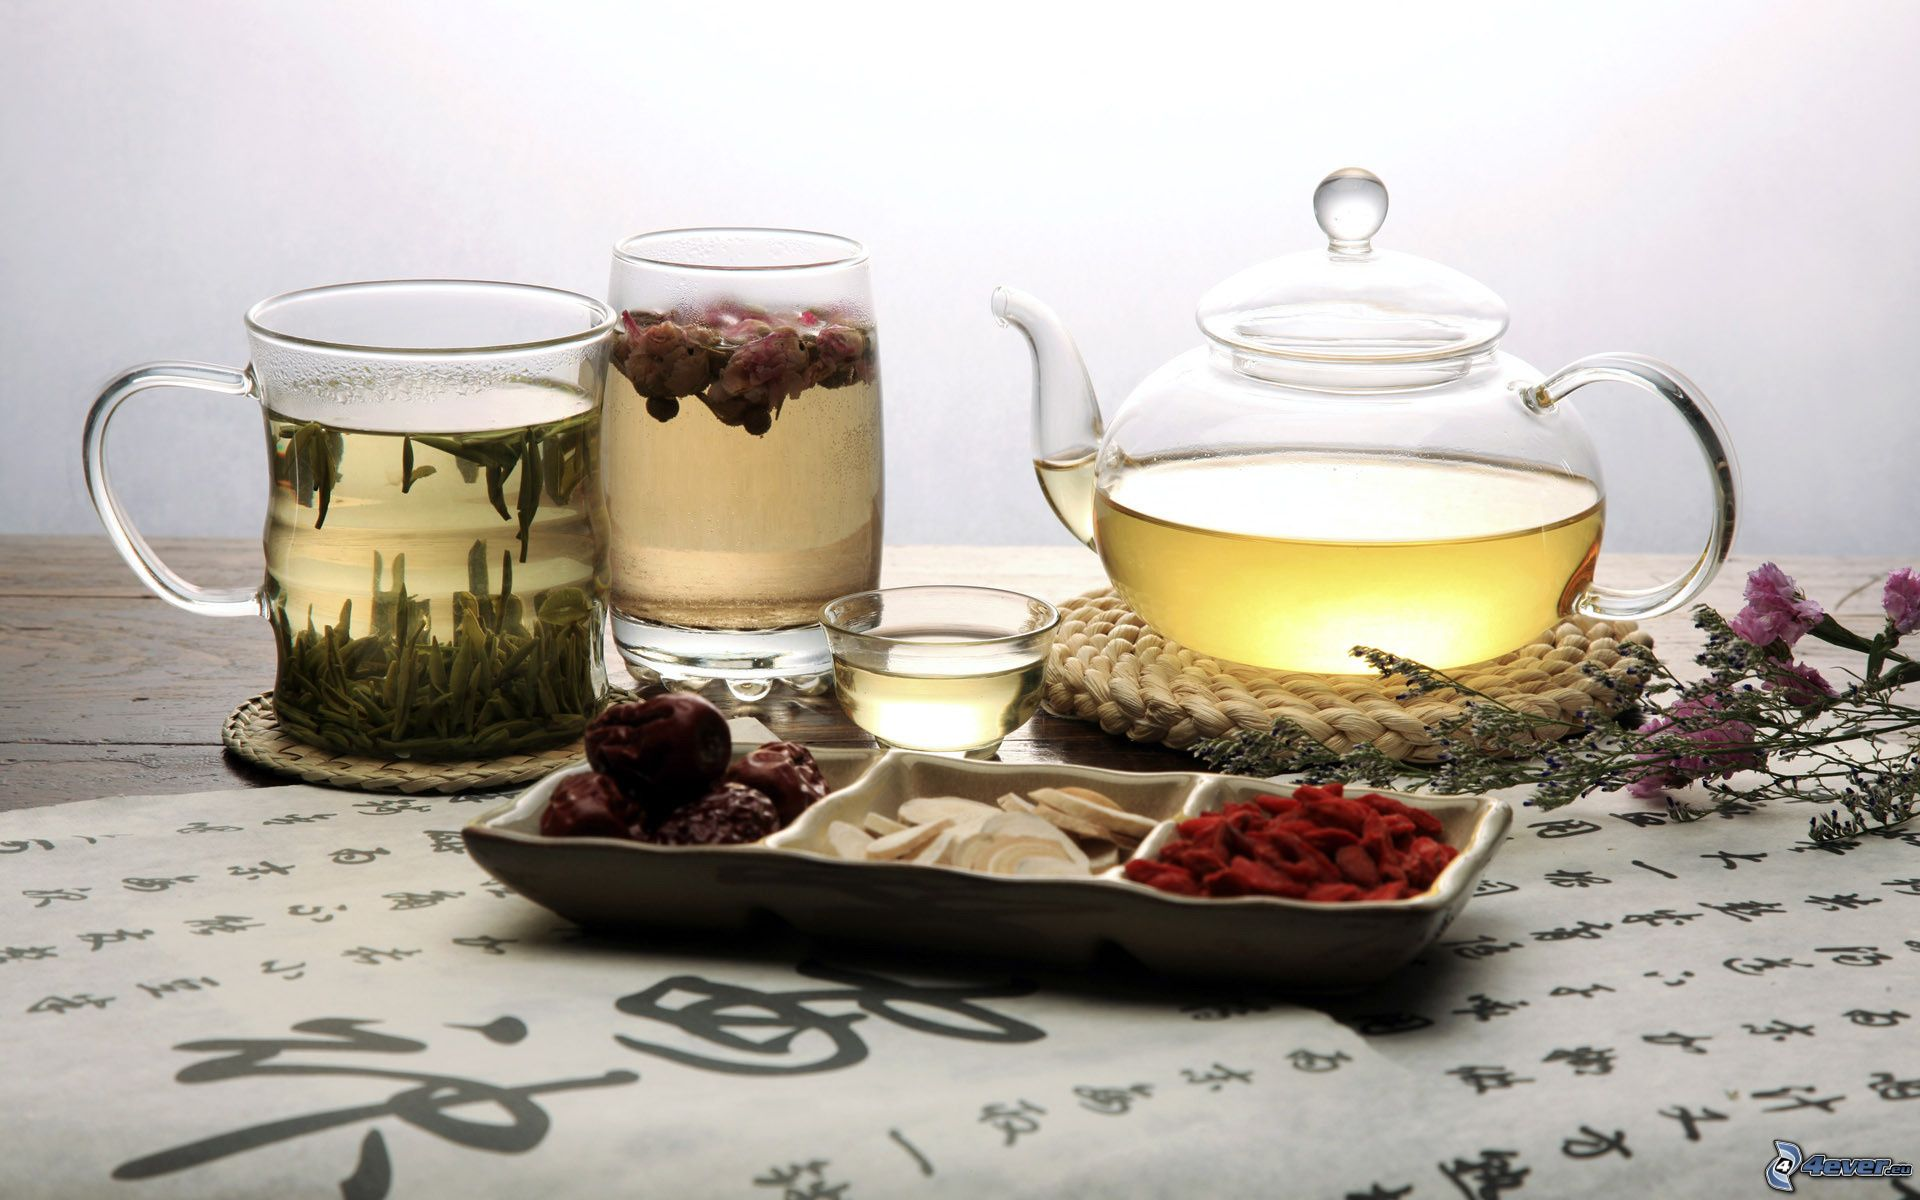 dieta personal infusiones antioxidantes. Black Bedroom Furniture Sets. Home Design Ideas